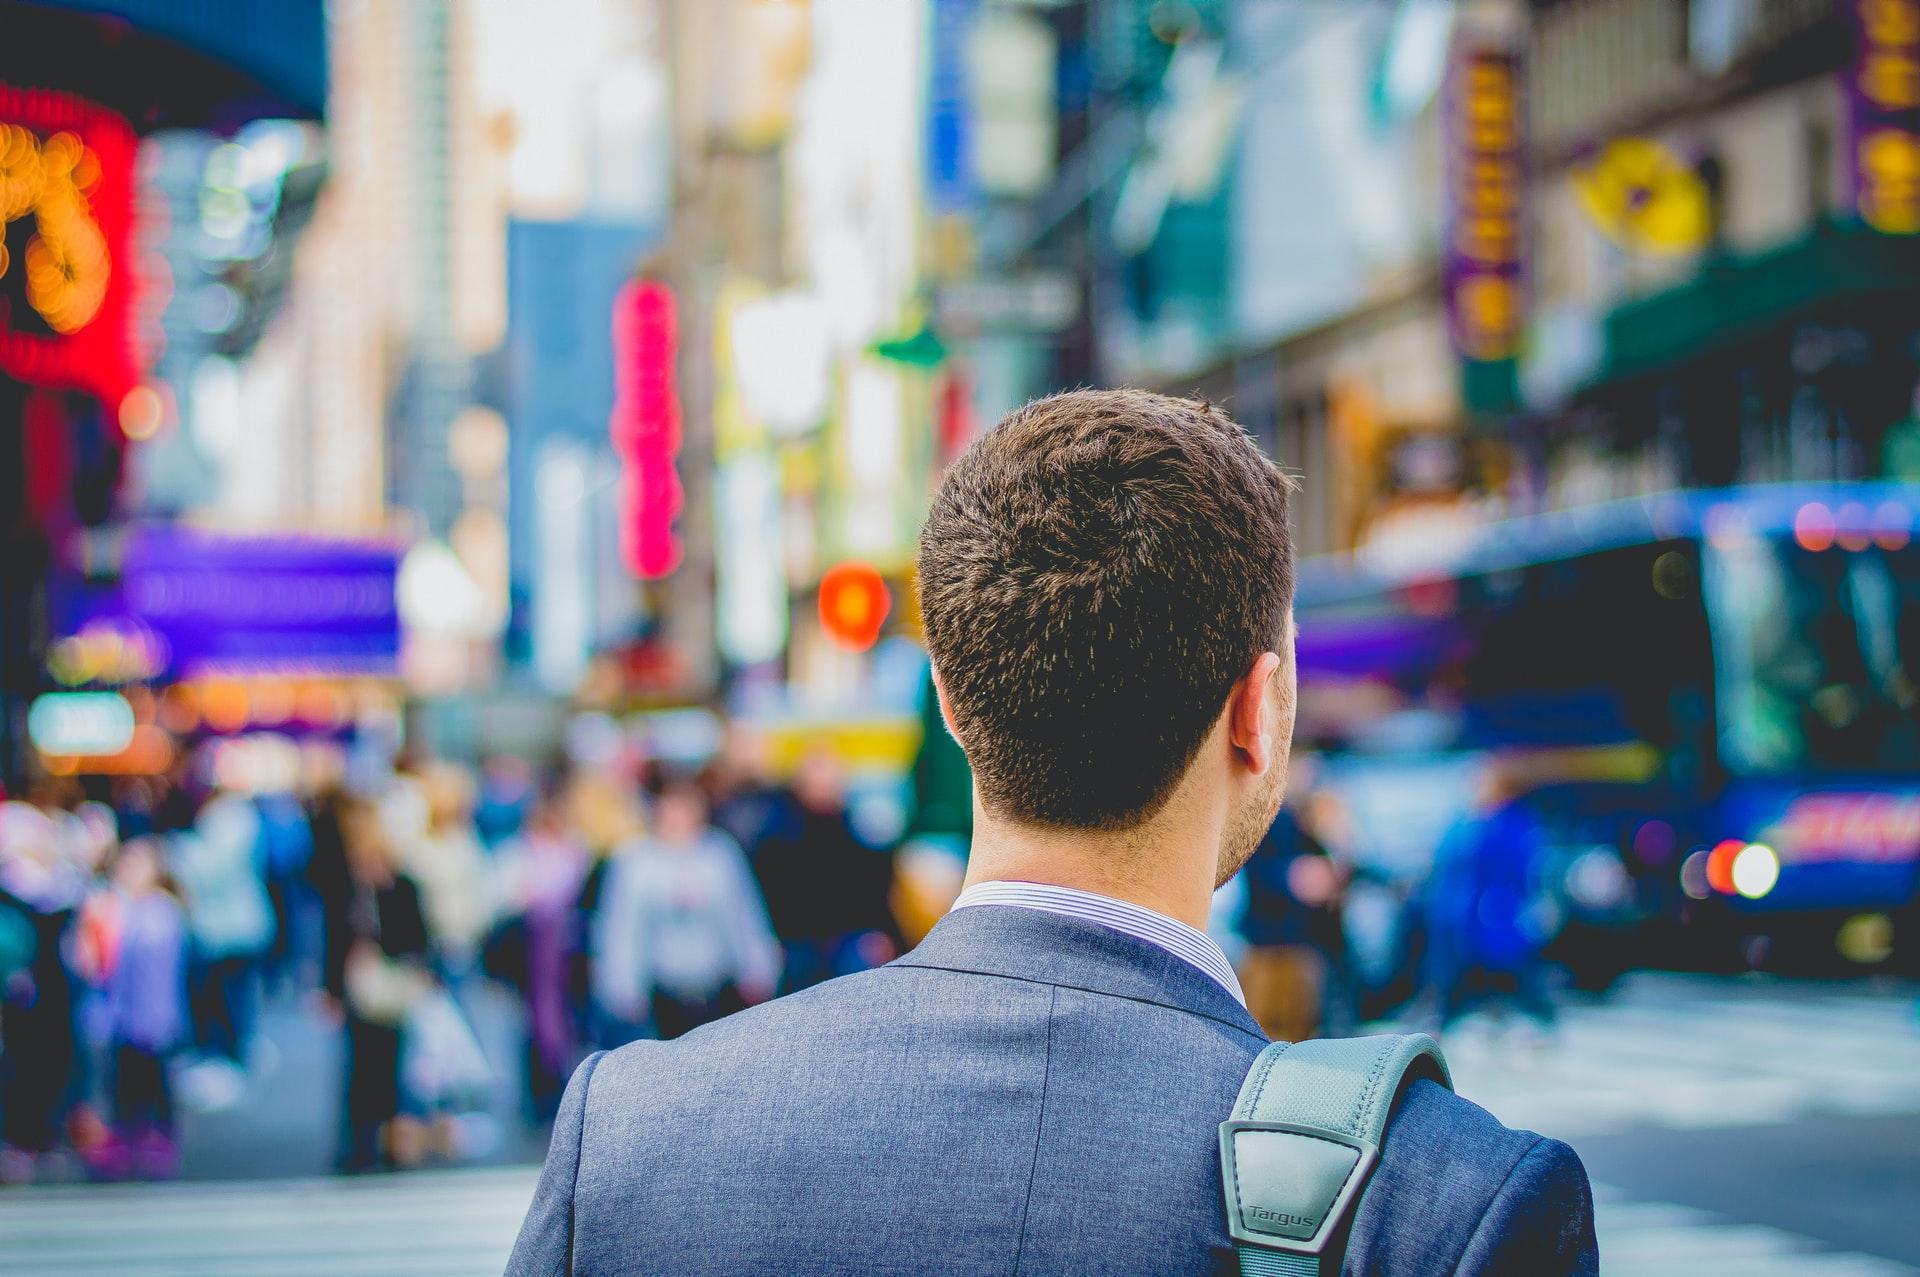 digital marketing careers